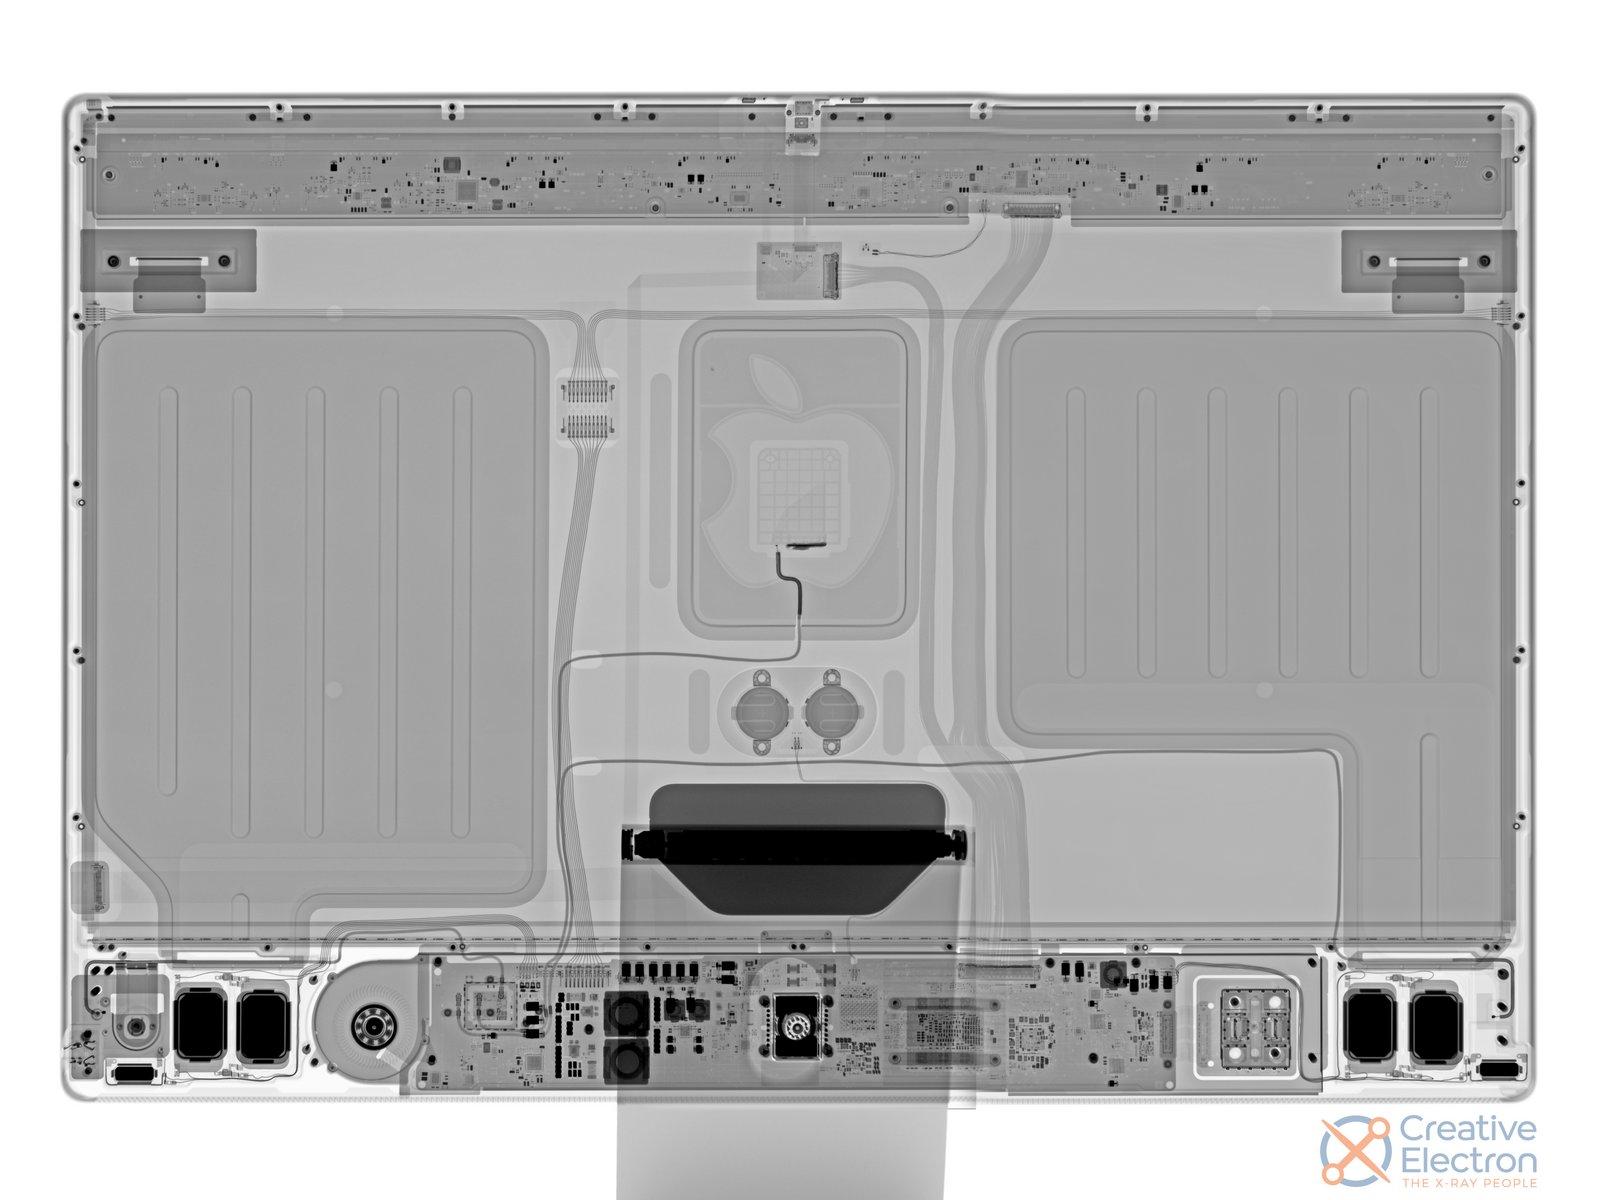 iMac con M1 visto a rayos x